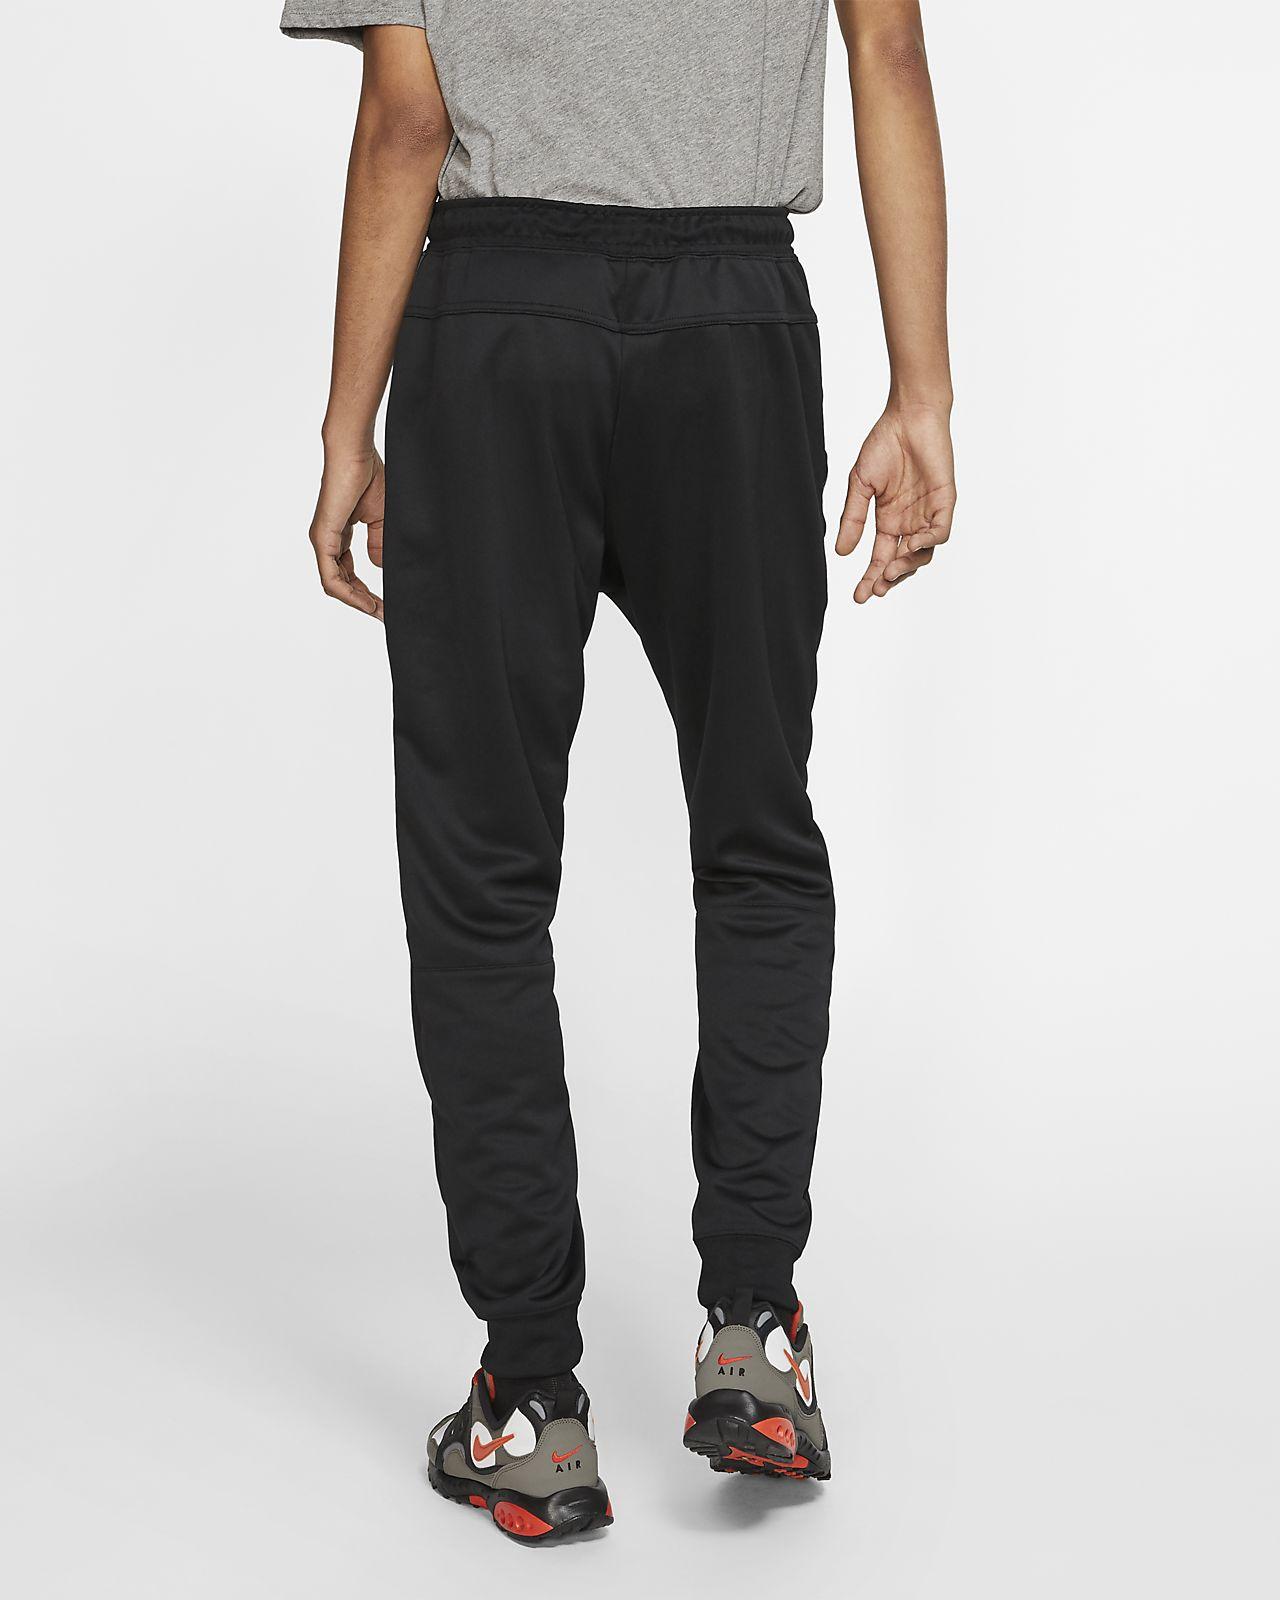 Jogger Nike Sportswear Air Max Uomo